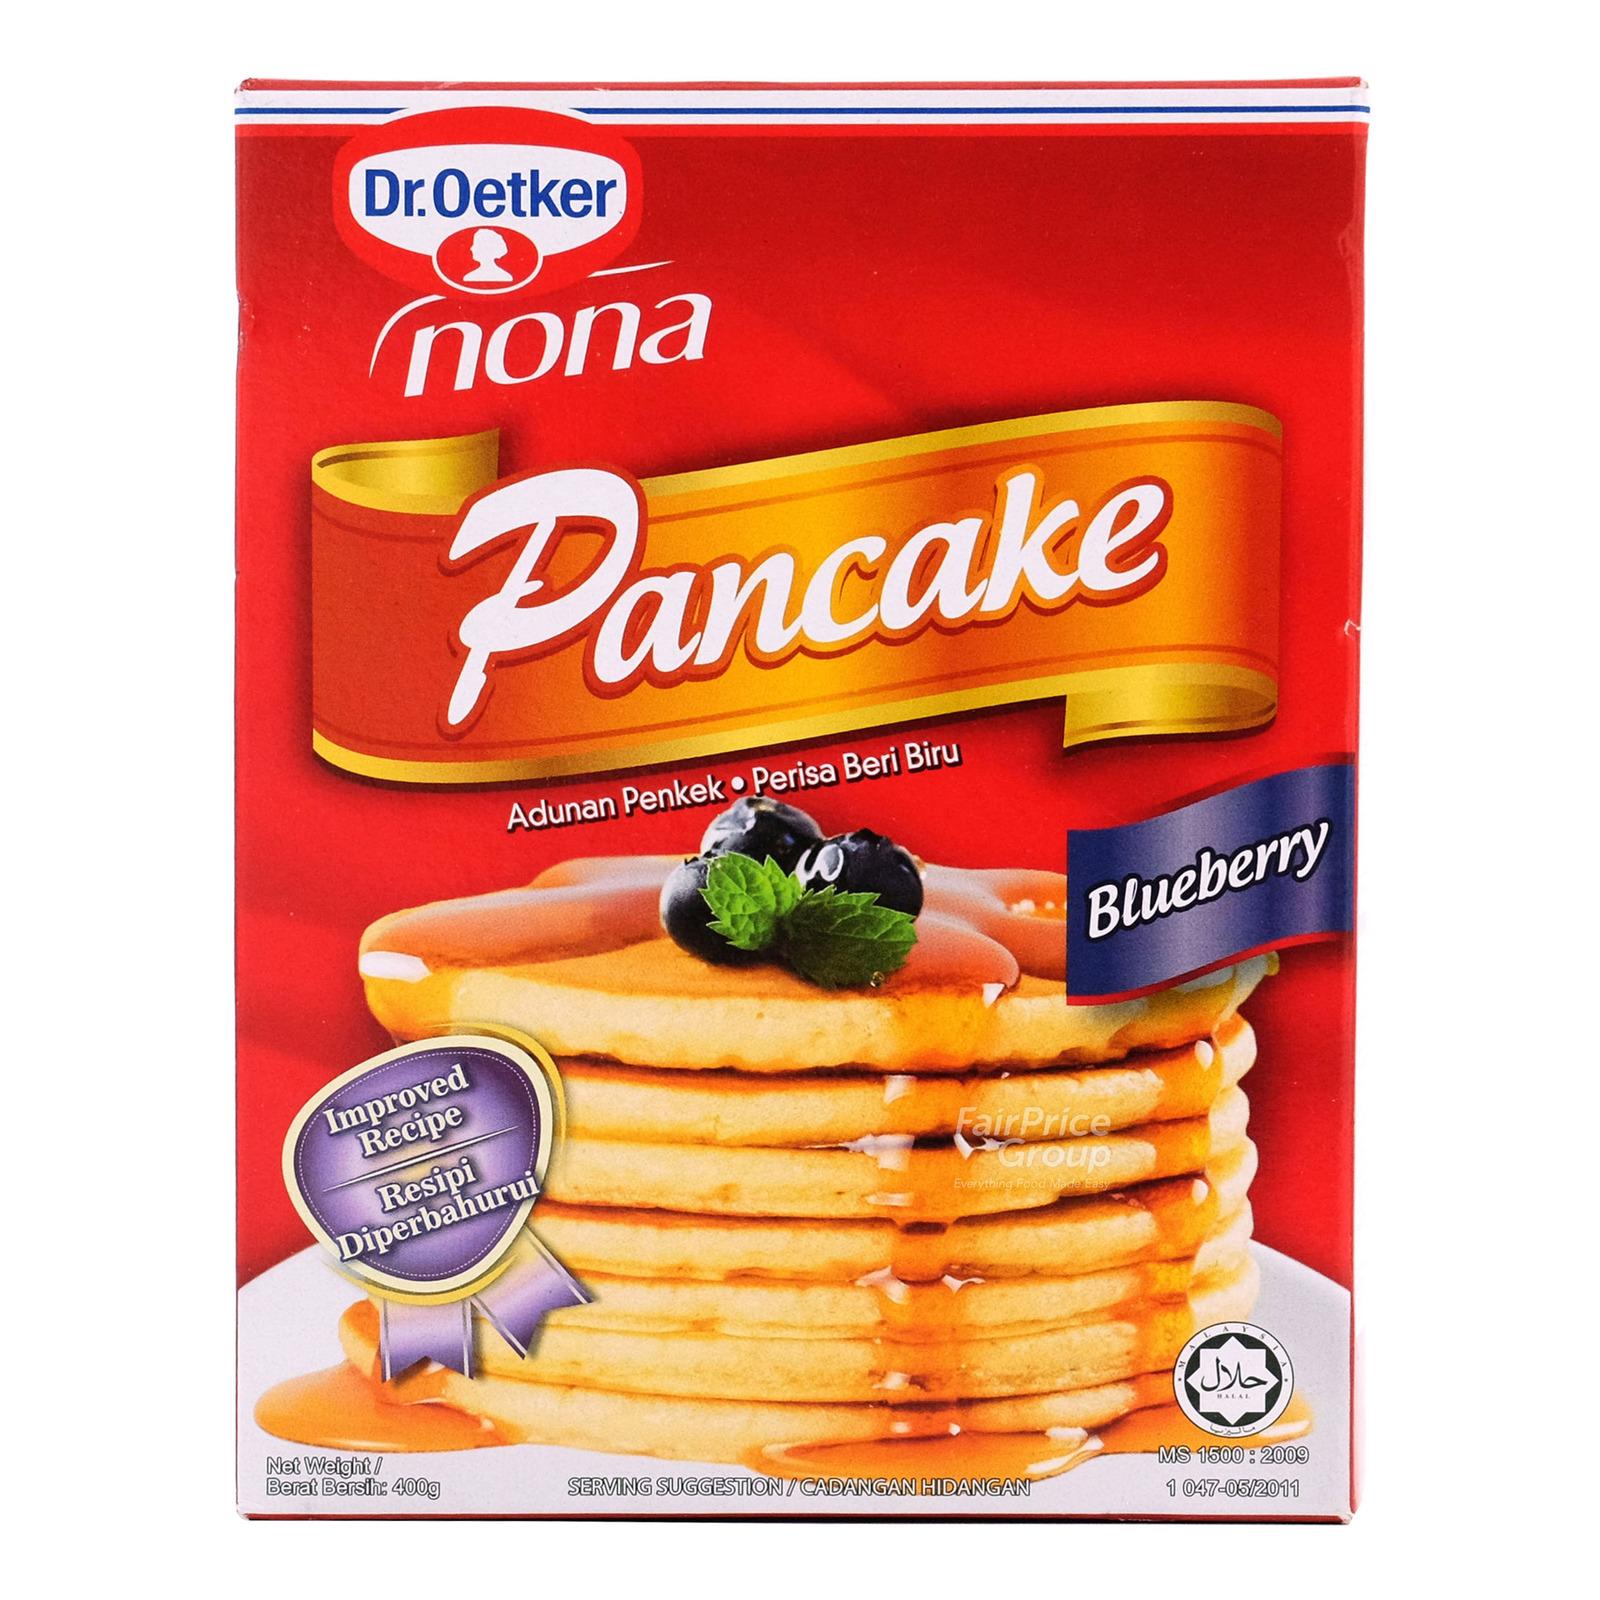 Dr Oetker Nona Pancake Mix - Blueberry